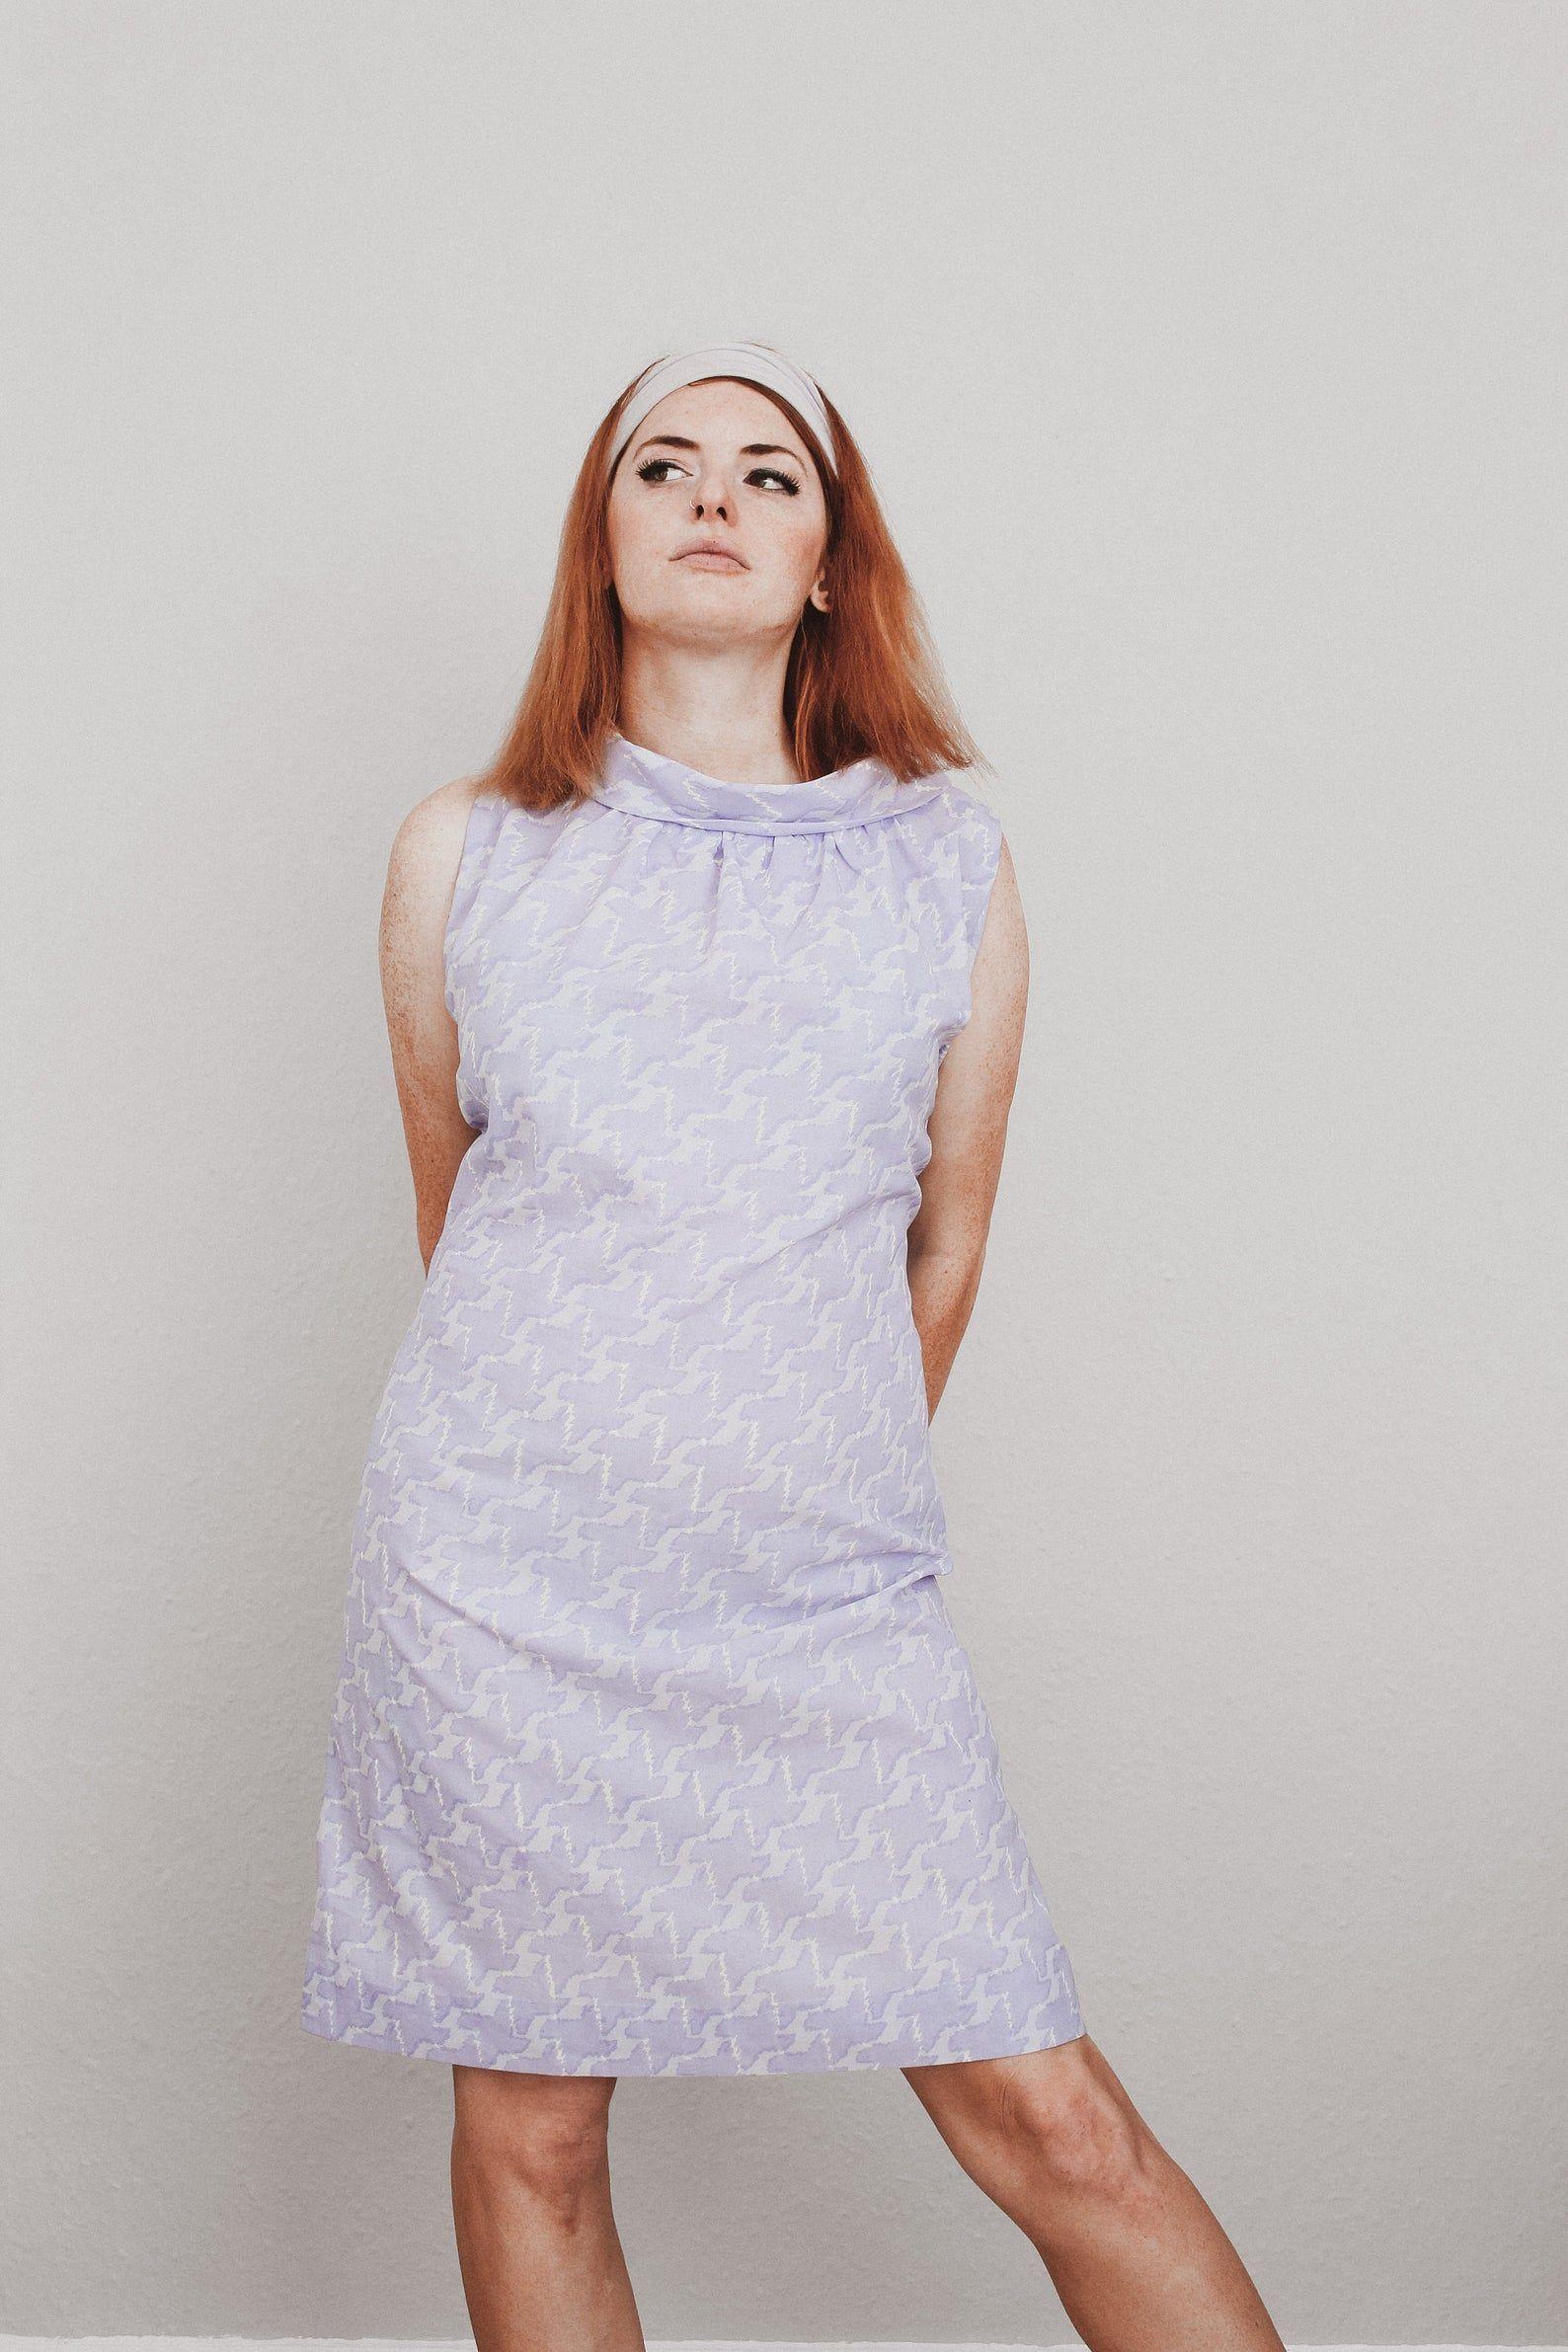 70s Lilac Shift Dress Etsy Shift Dress Dresses Shift Dress Pattern [ 2382 x 1588 Pixel ]